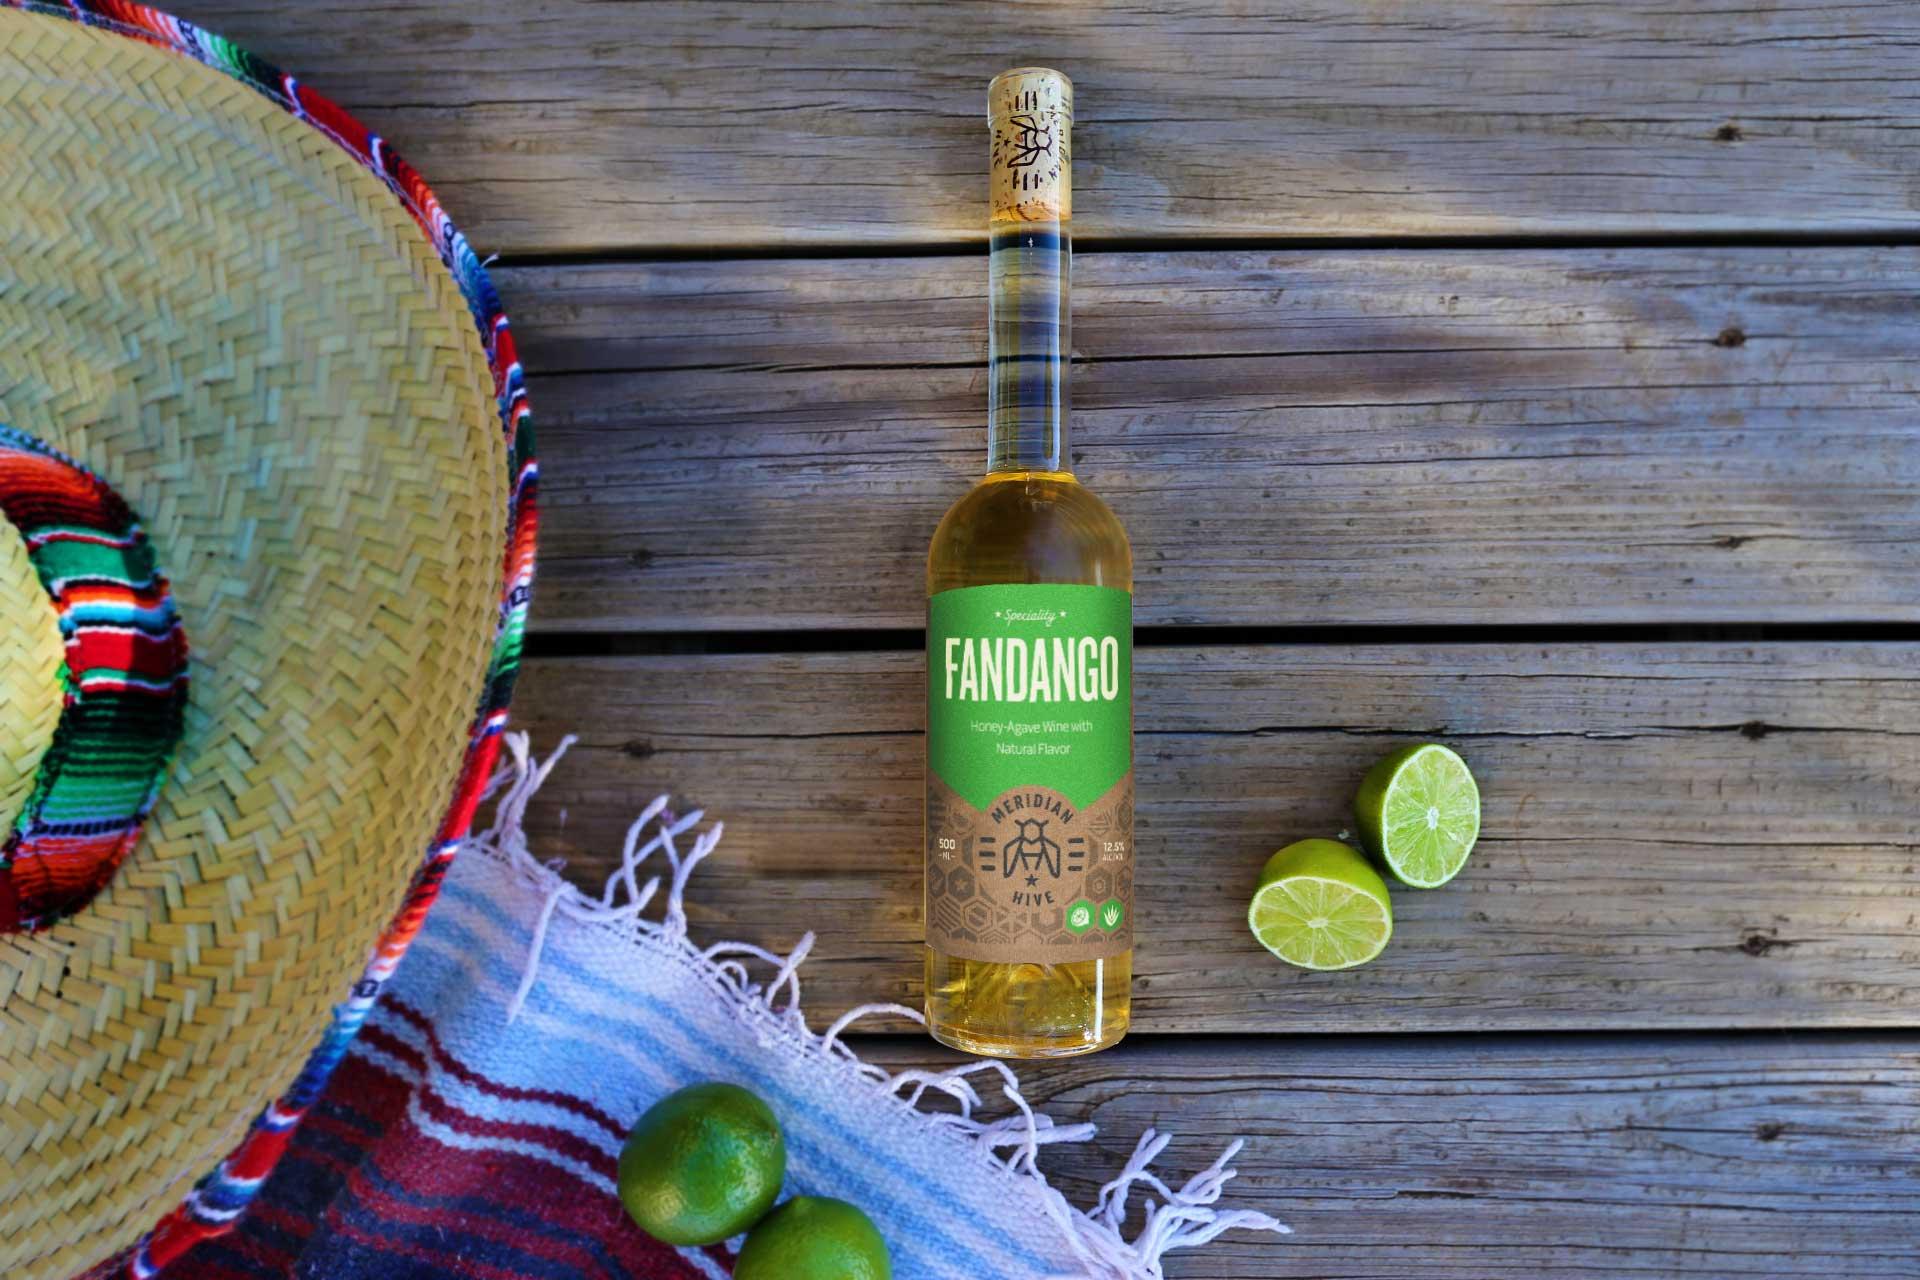 Fandango Release Picture